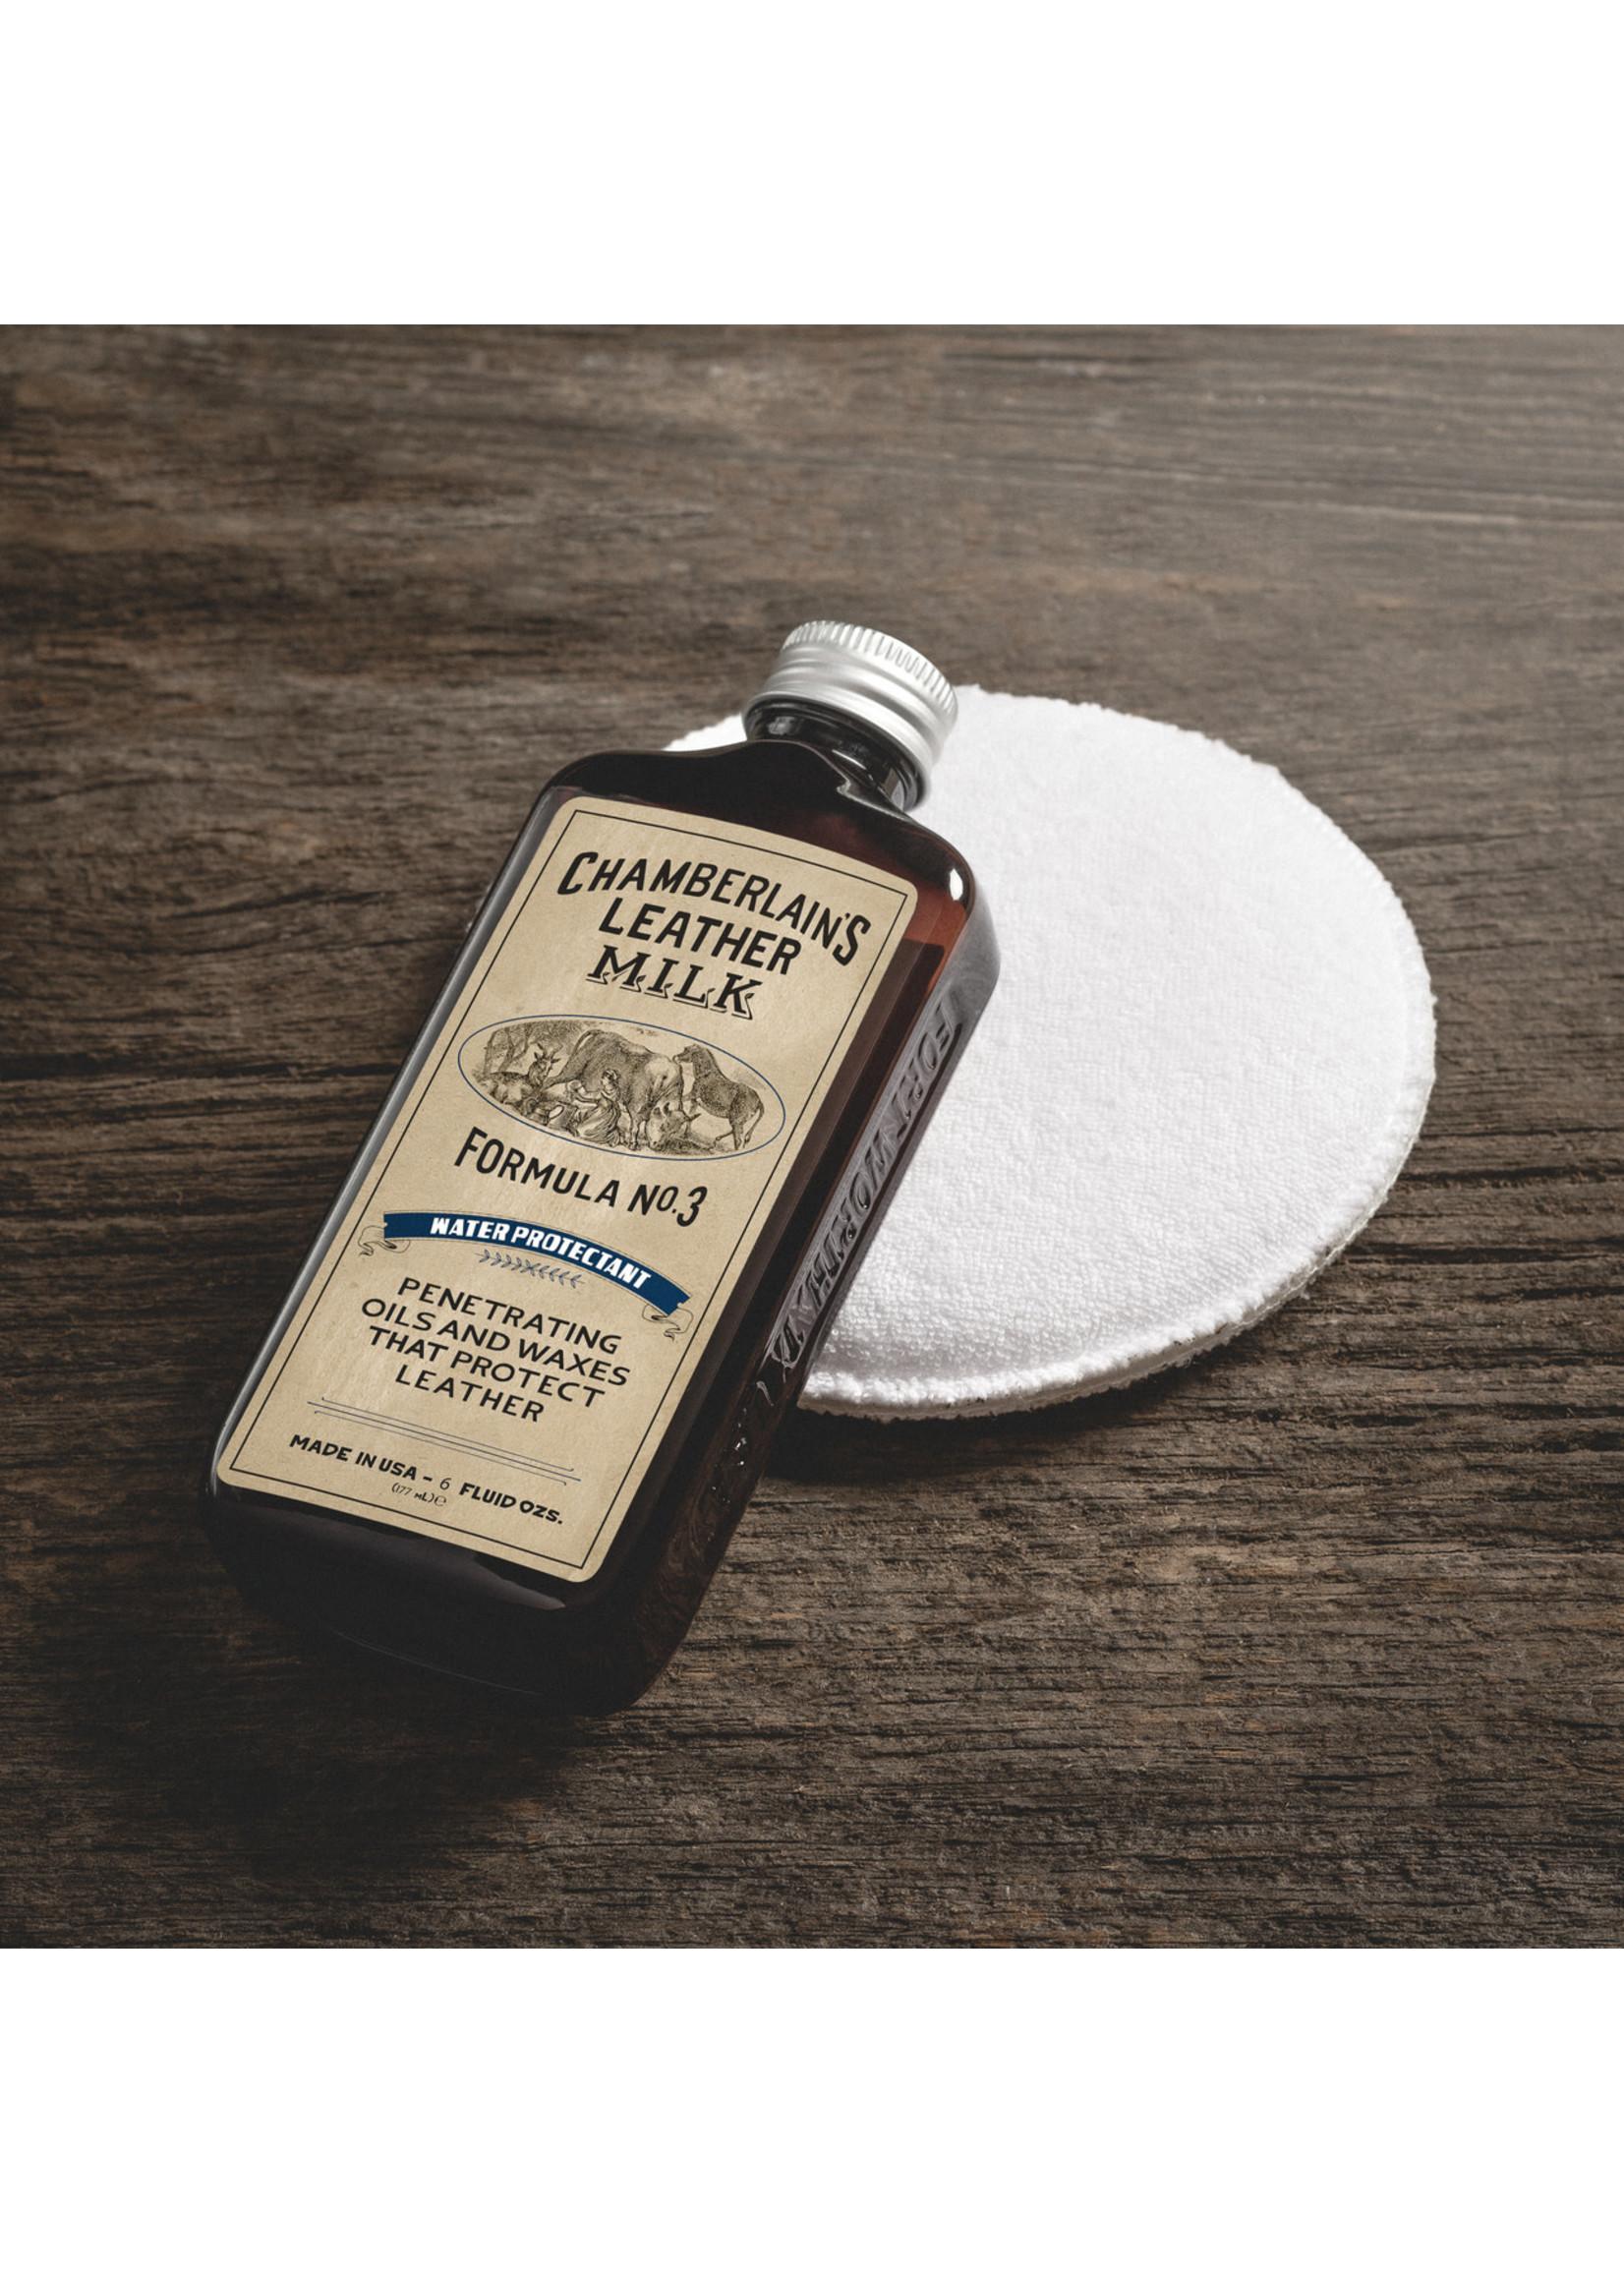 Chamberlain's Leather Milk Chamberlain's Leather Milk - Formula No. 3 Water Protectant